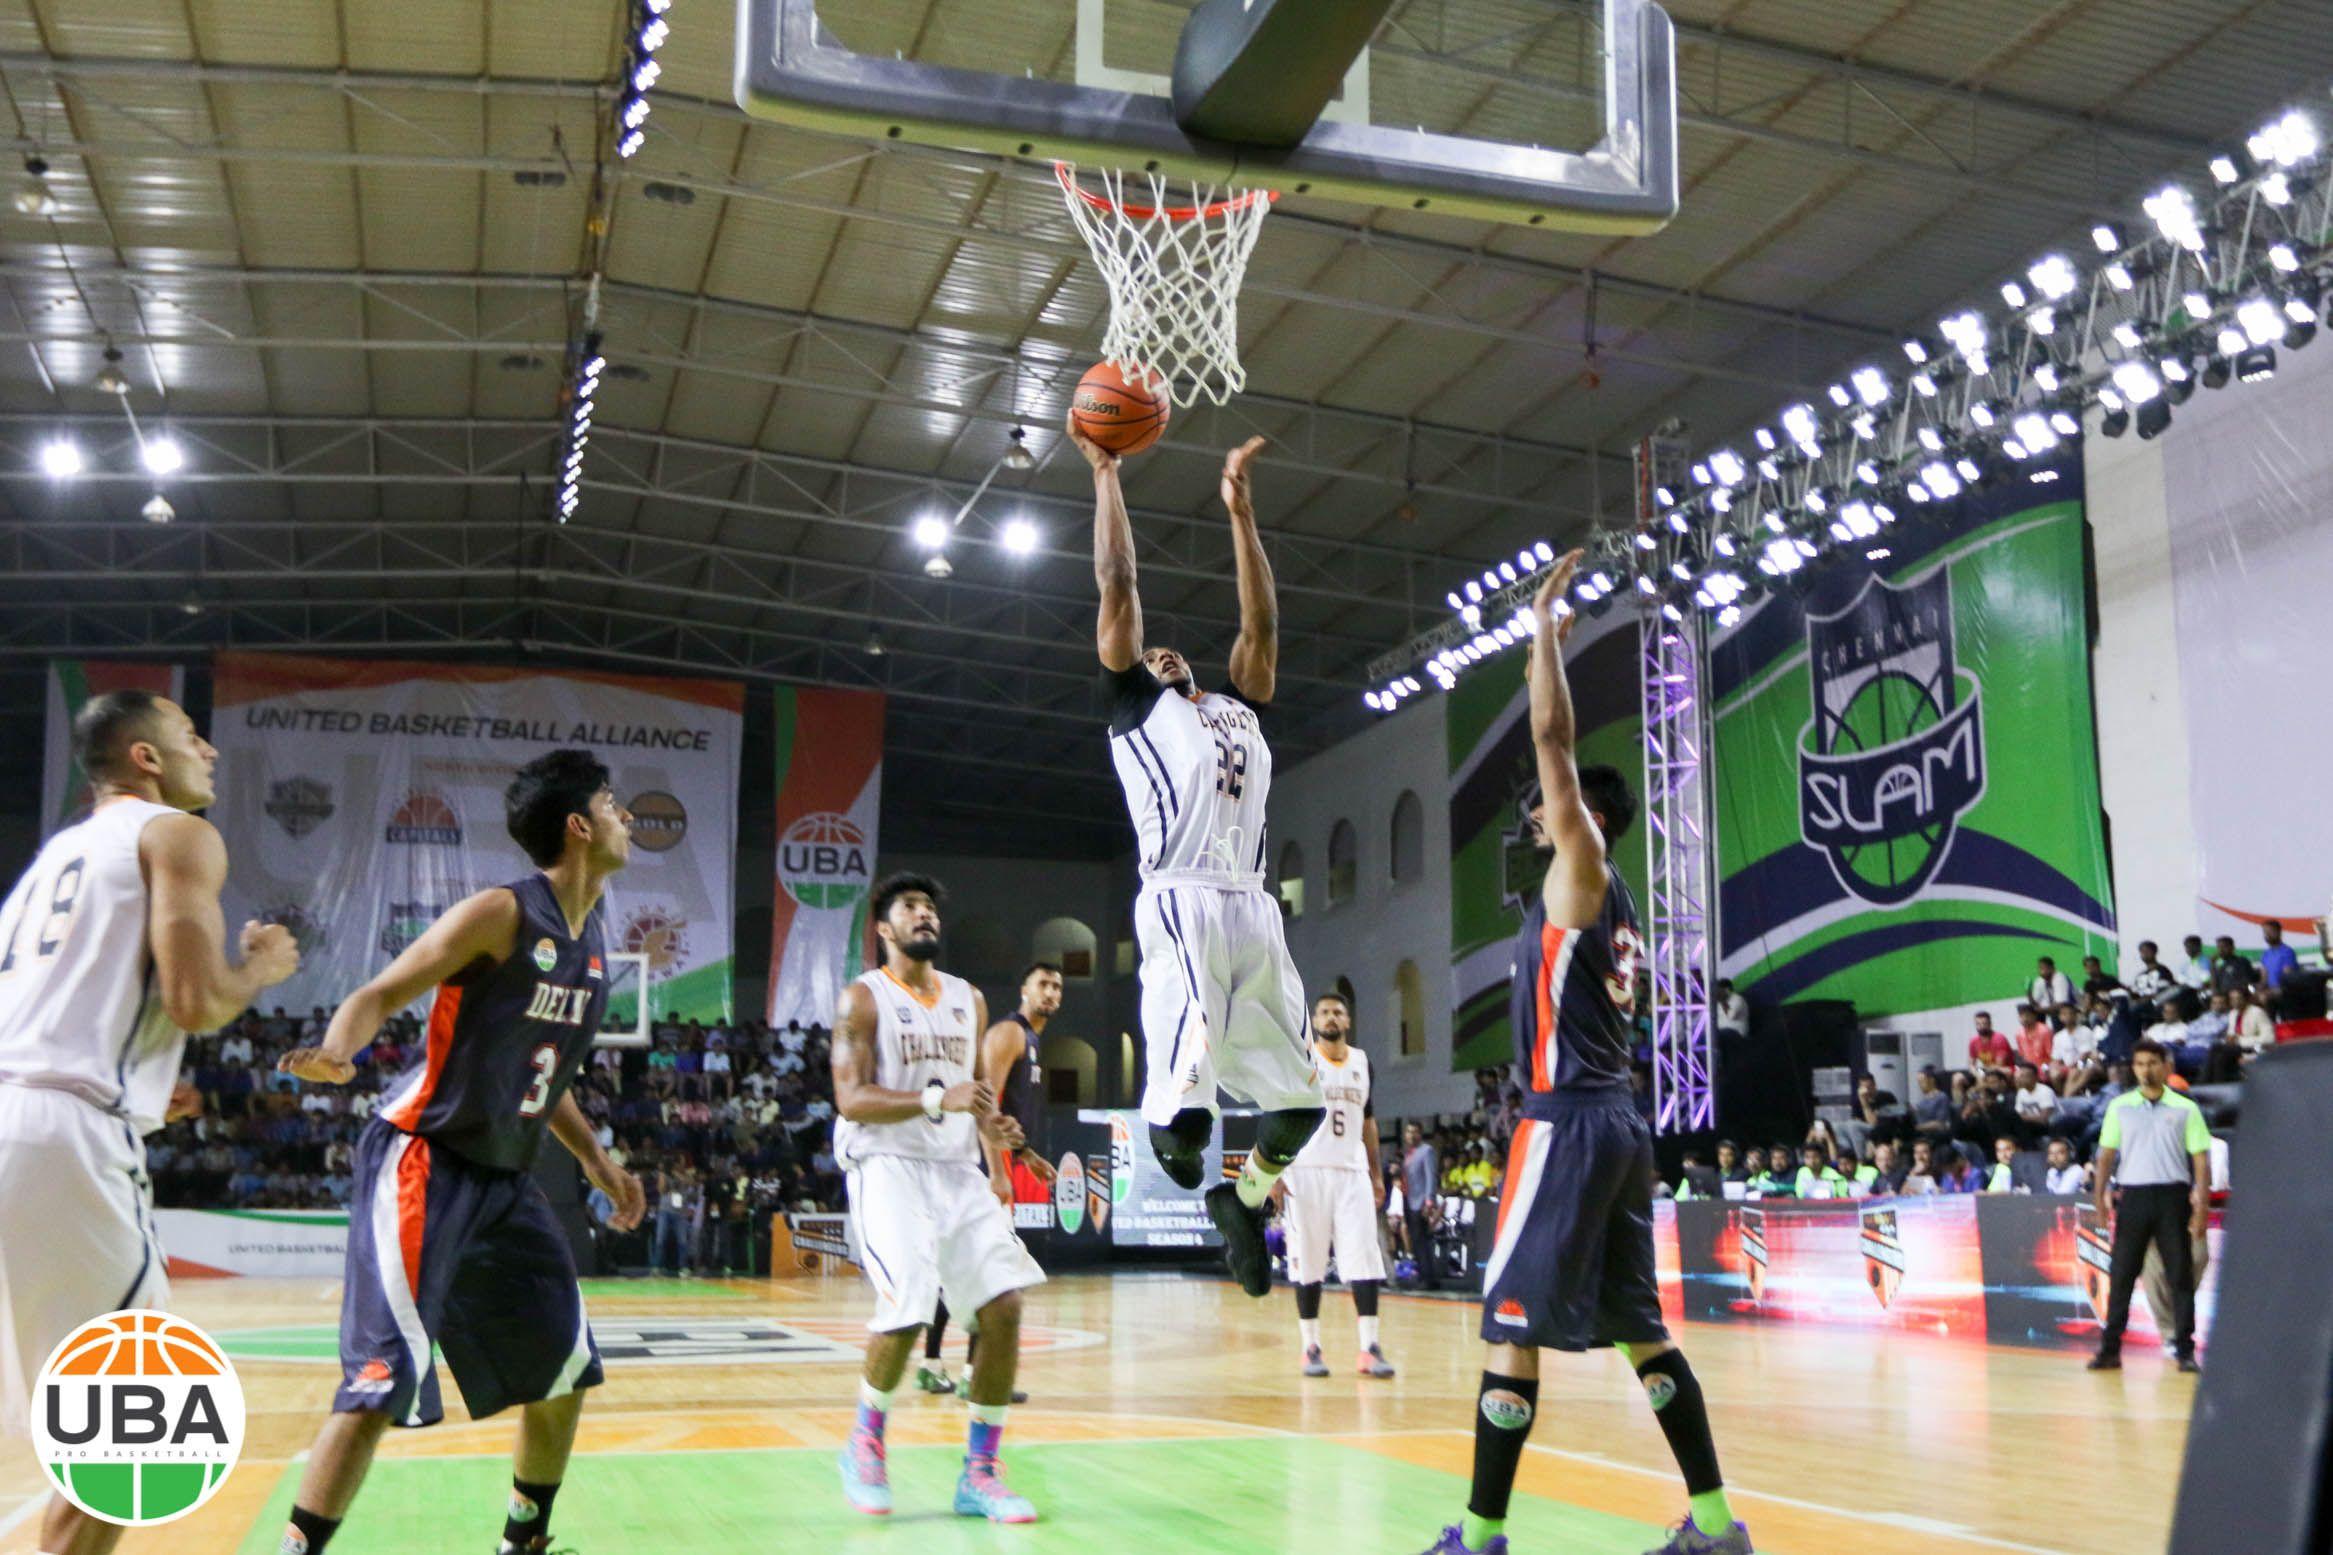 Jimmy Scroggins Getting Right Up To The Rim Vs Delhi Capitals Ubaindia Ubaseason4 Basketball Teams Uba Season 4